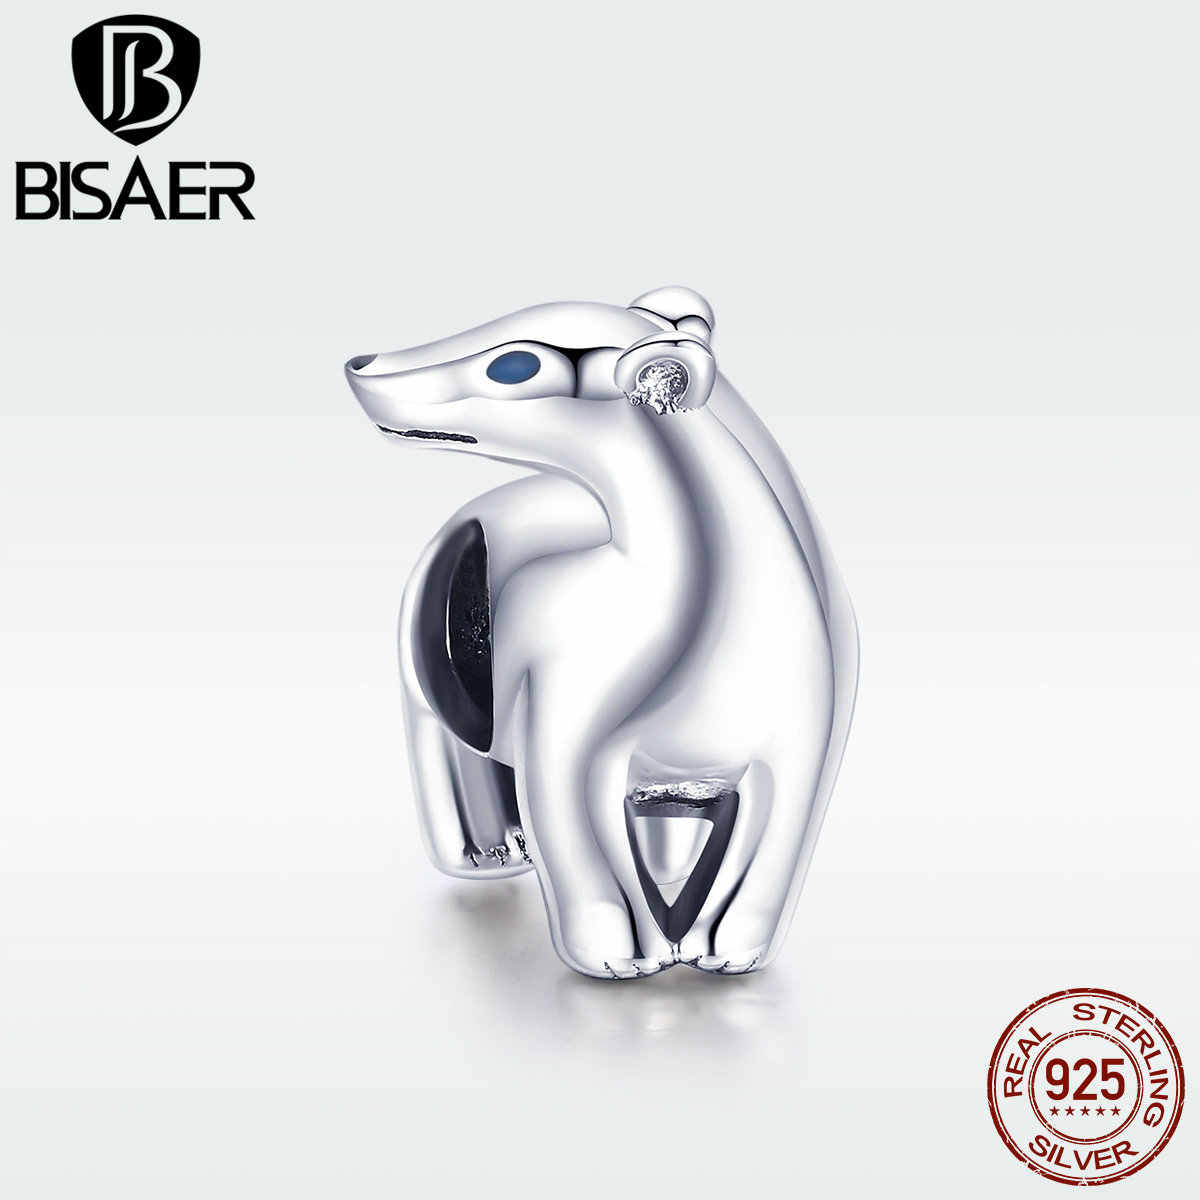 BISAER แท้ 925 Sterling Silver Polar Bear ลูกปัดสัตว์ Charms พอดีกำไลข้อมือผู้หญิงกำไลข้อมือเครื่องประดับ DIY ทำ EFC058